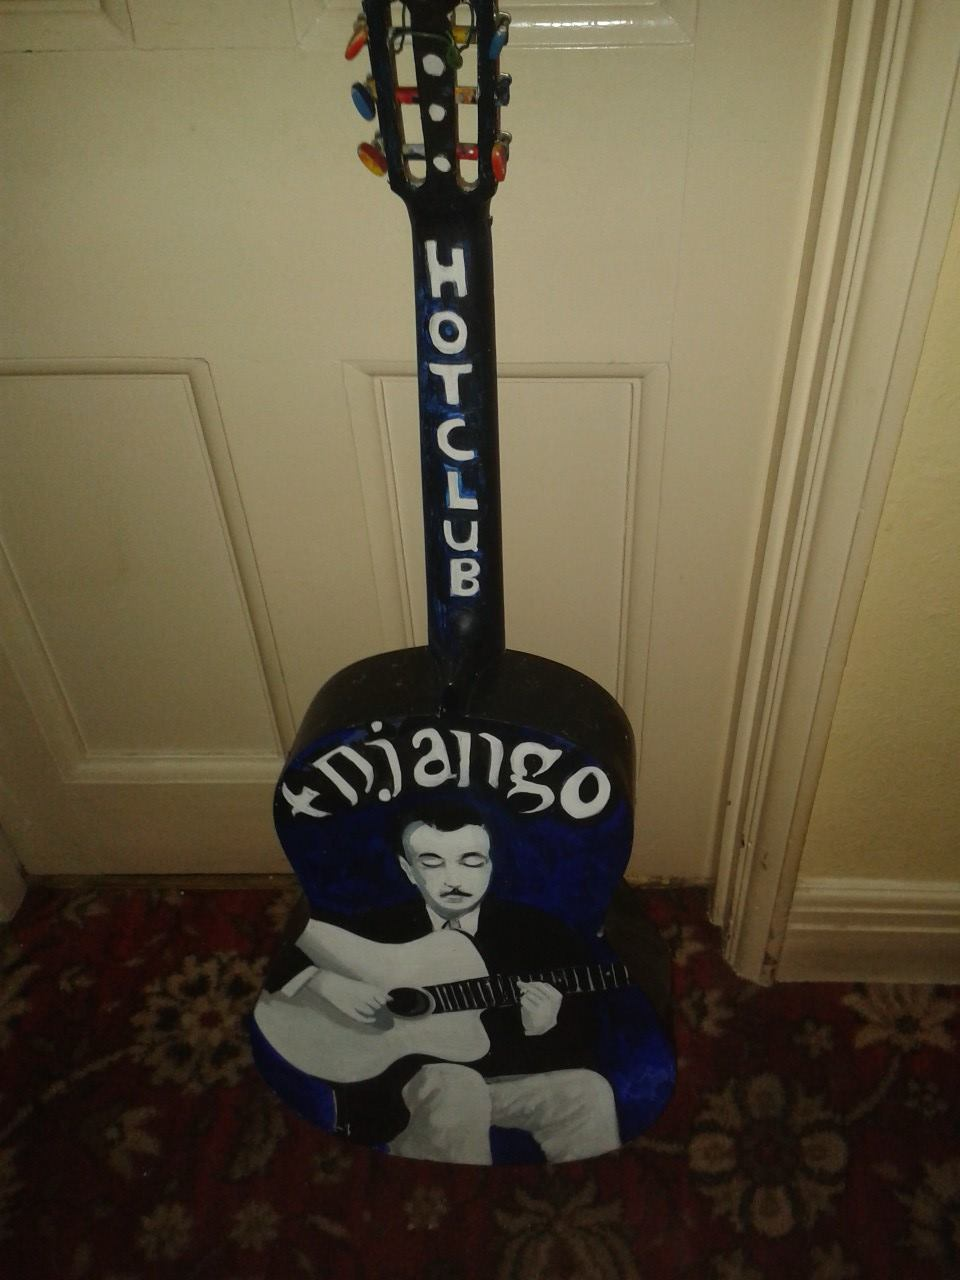 Django art on guitar